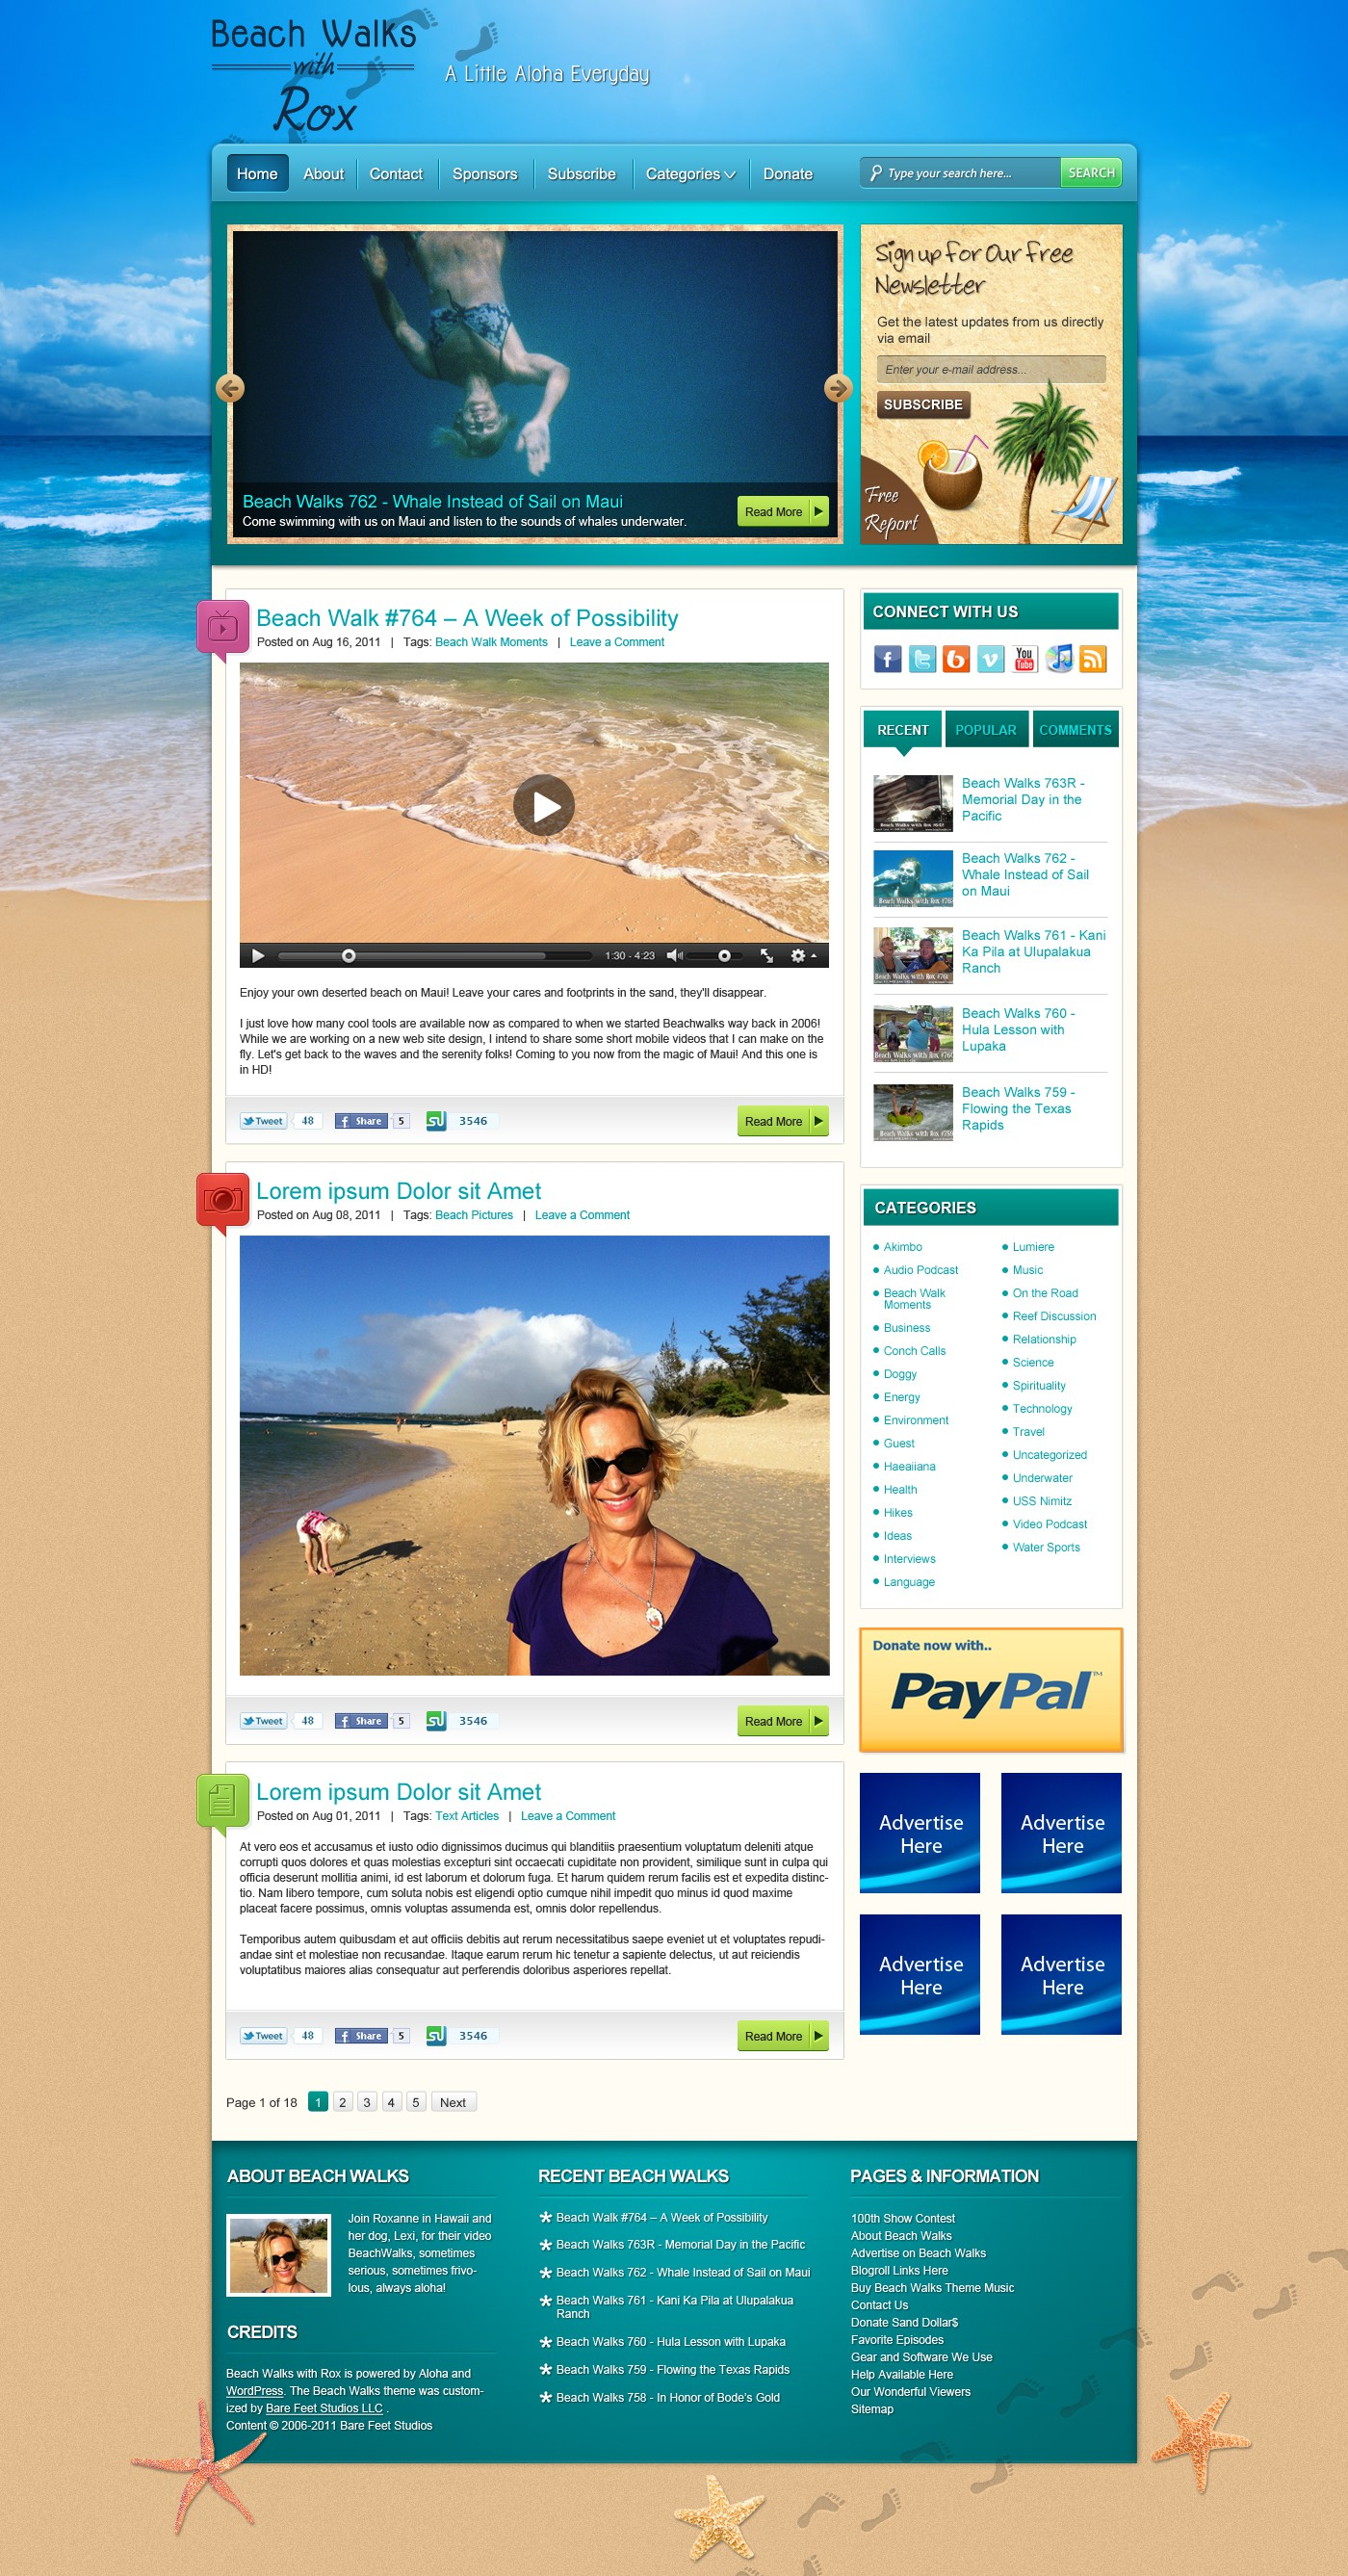 Blog design: Beach Walks with Rox, internet TV show